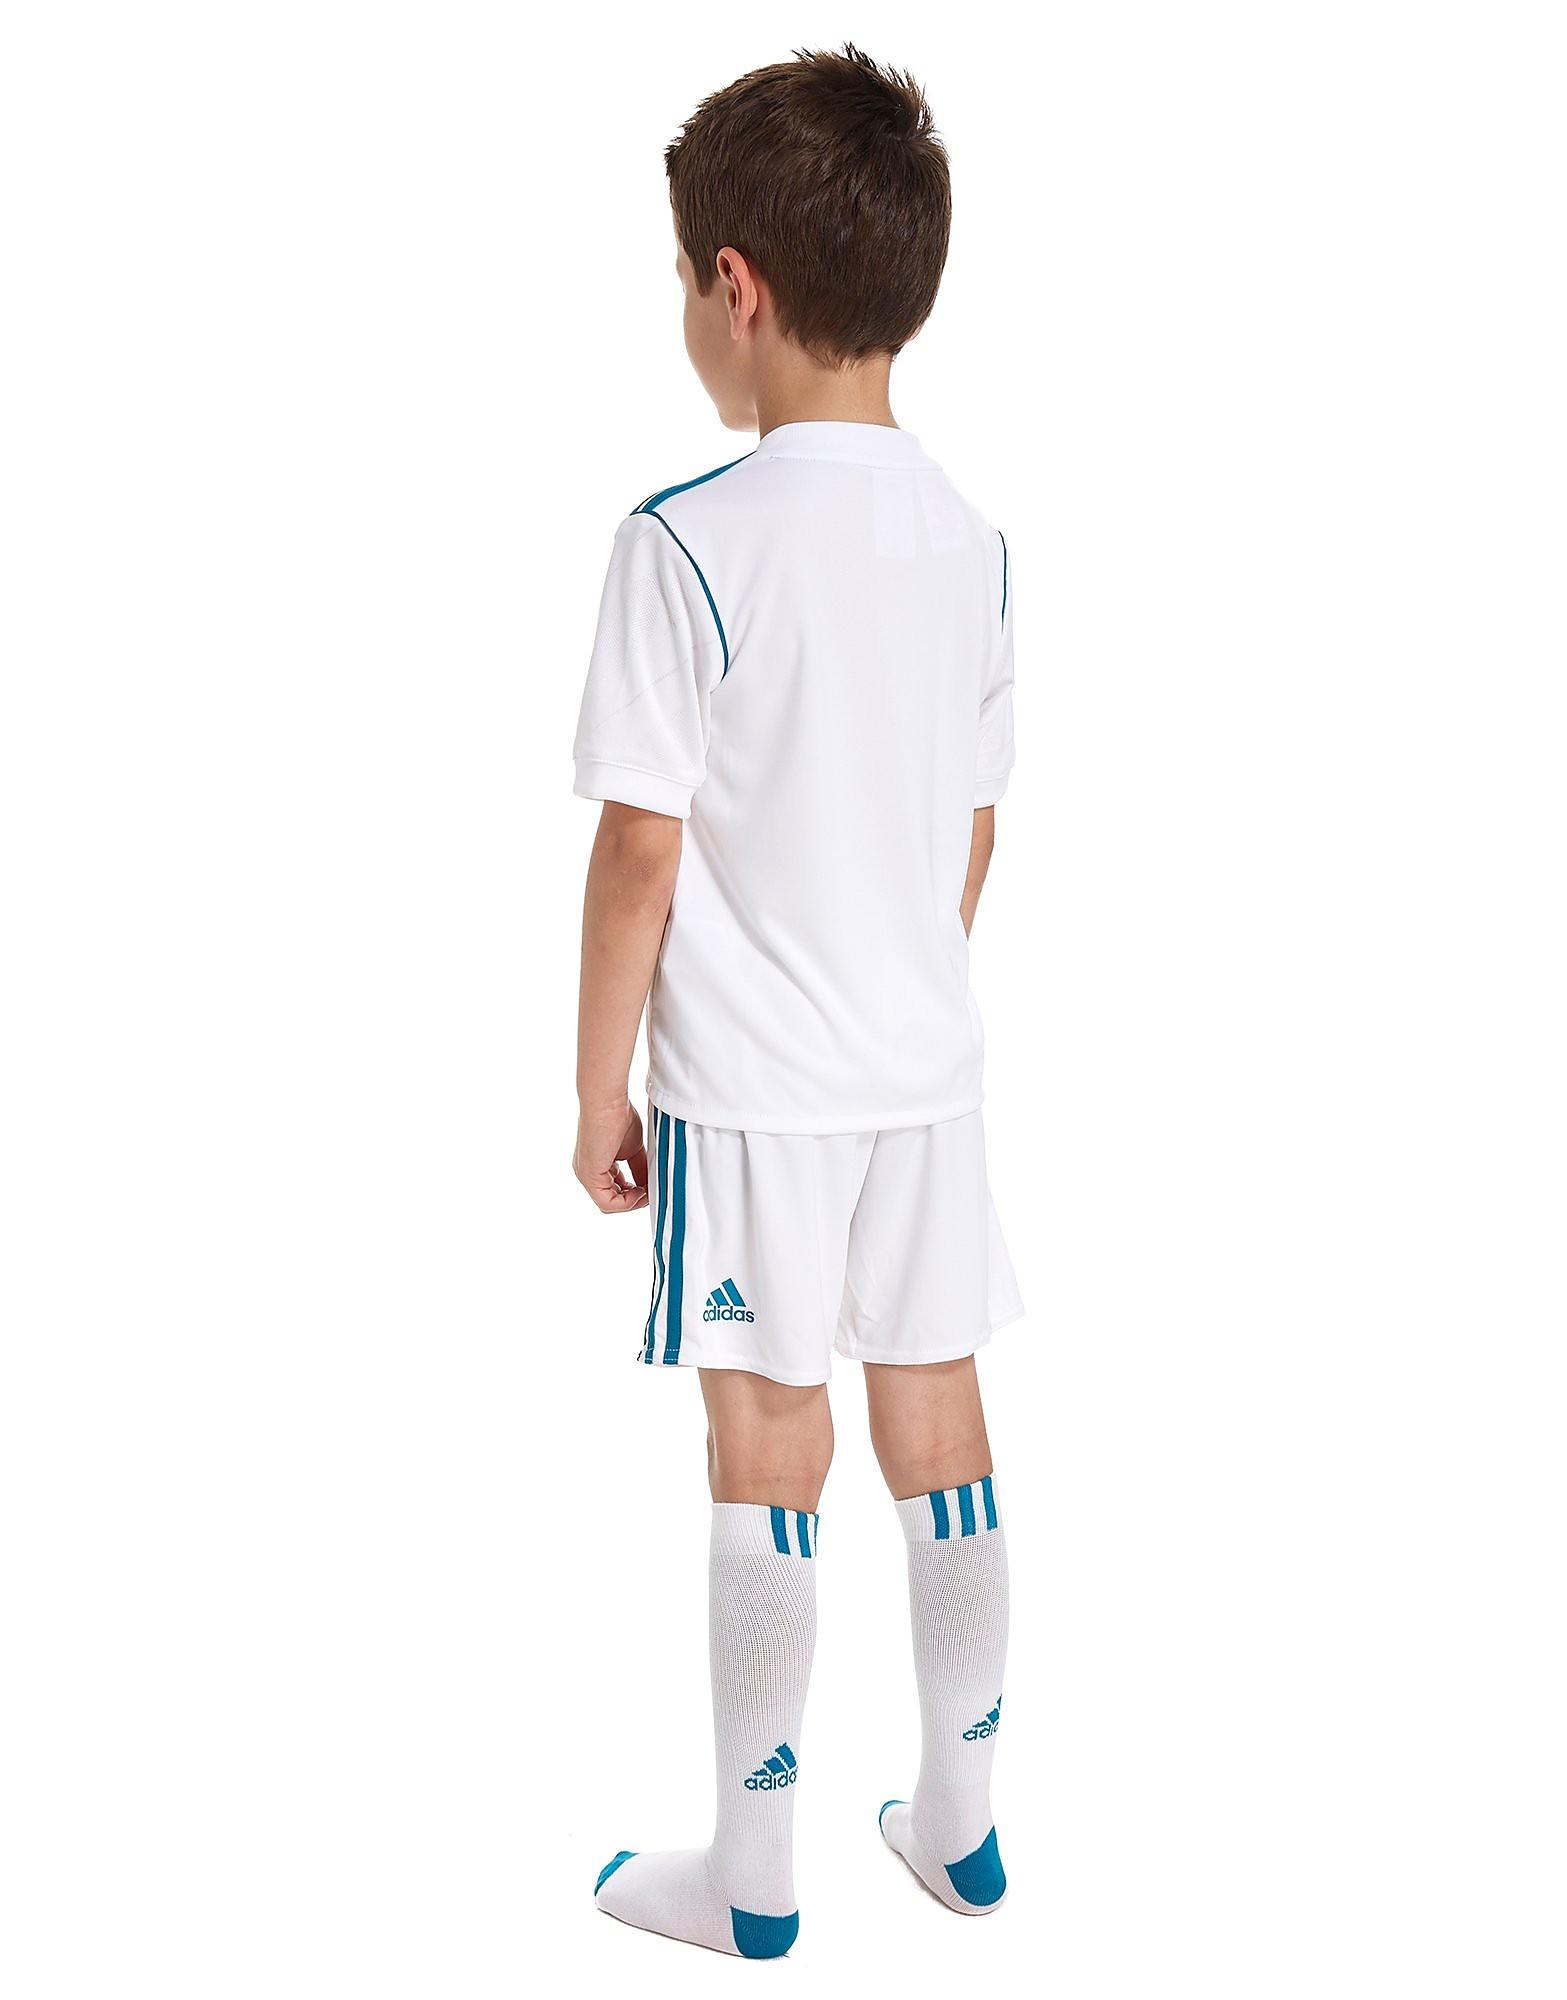 adidas Real Madrid 2017/18 Home Kit Children